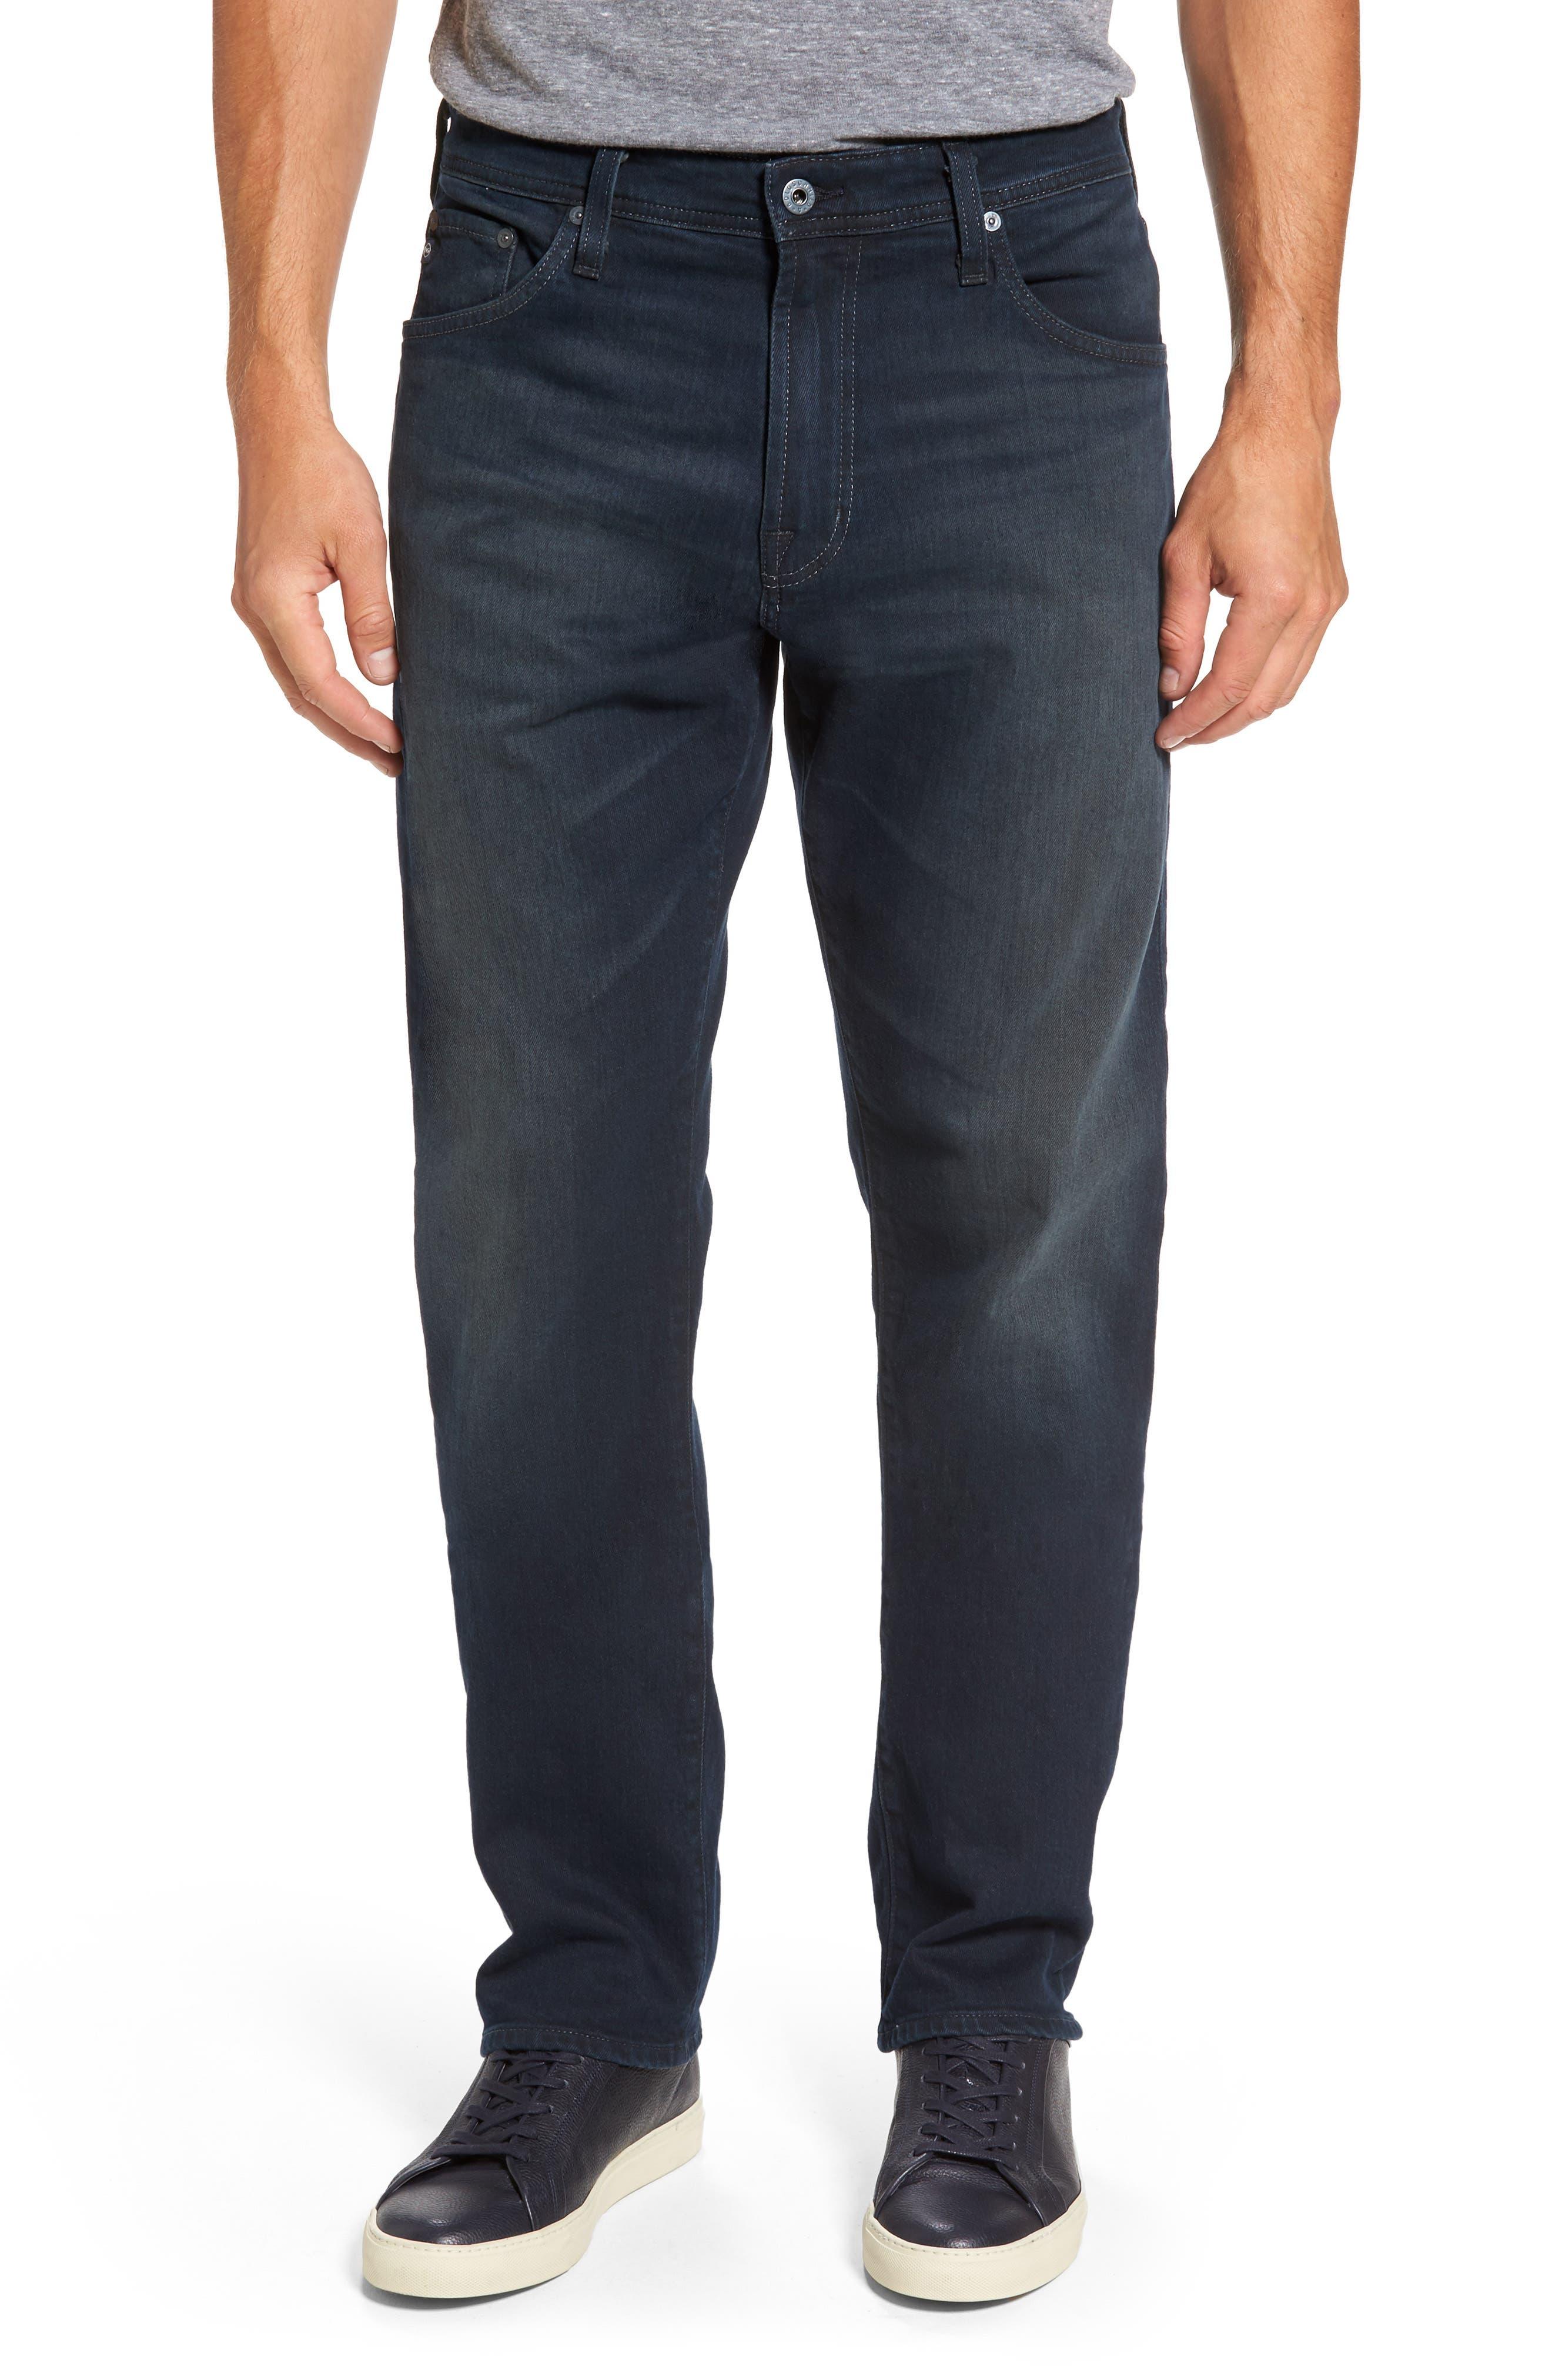 Ives Straight Fit Jeans,                         Main,                         color, Blue Smolder